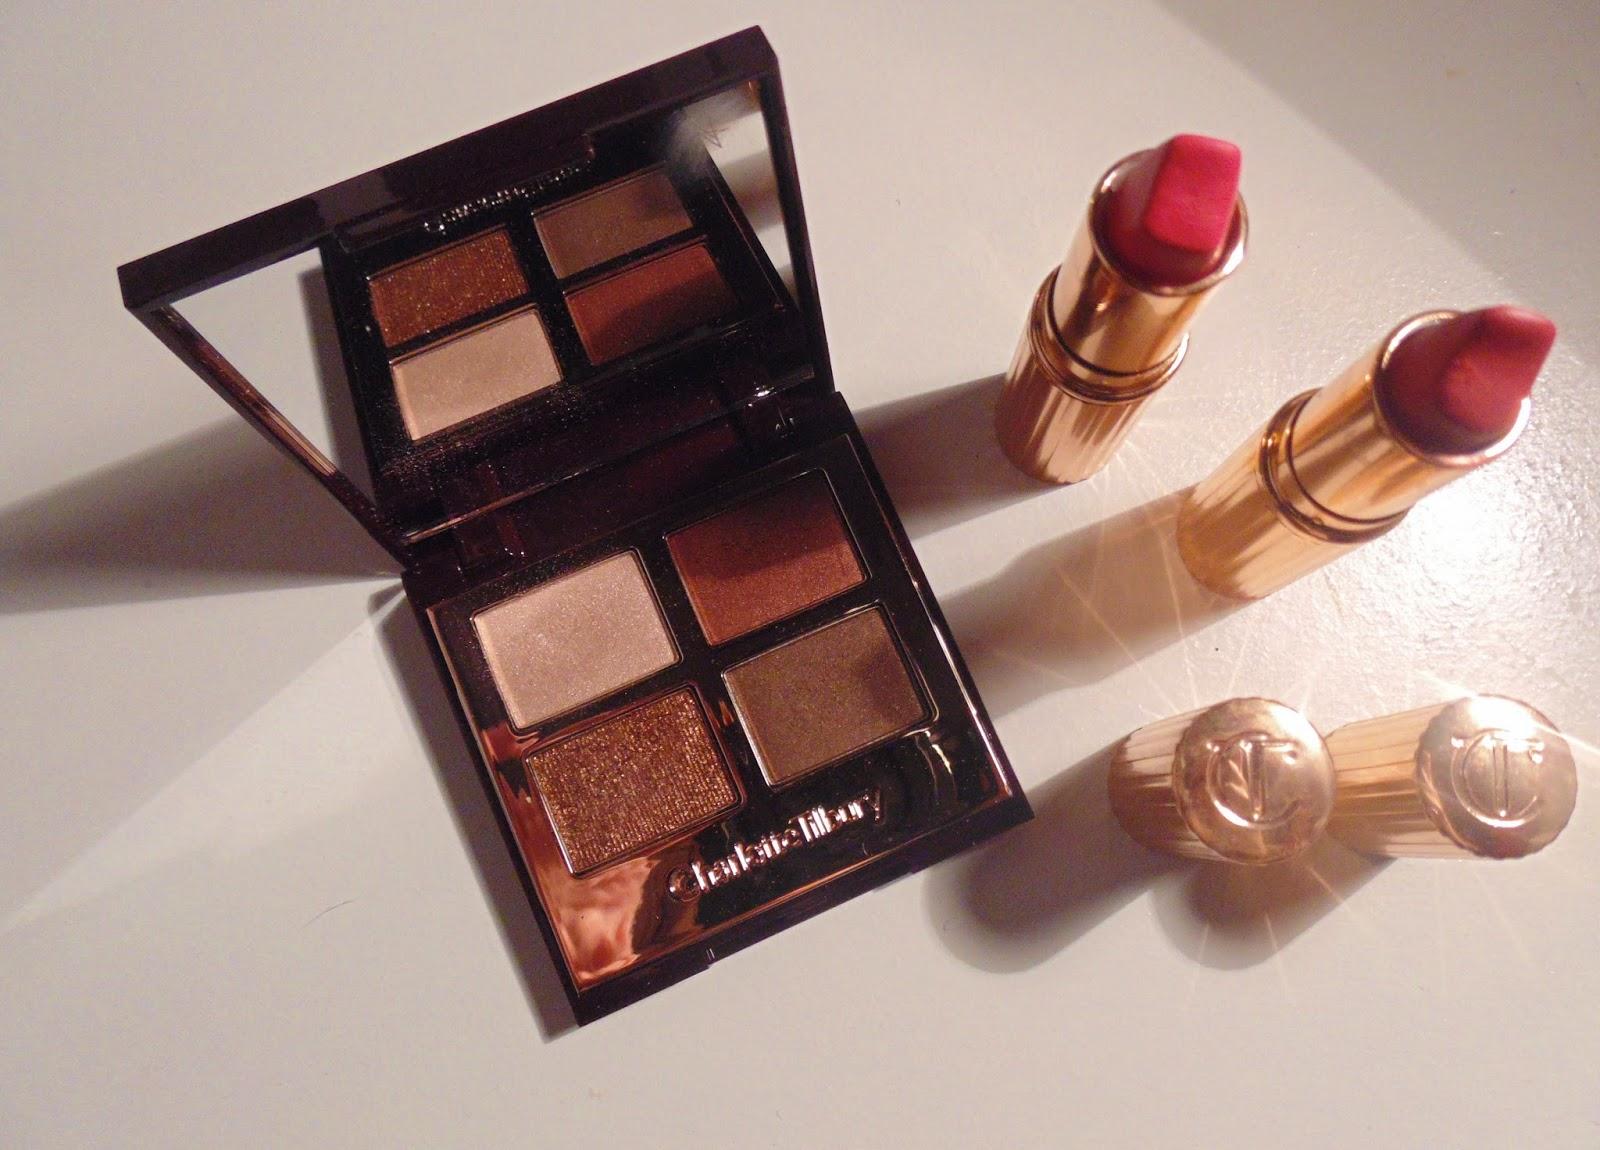 Charlotte Tilbury Makeup dolce vita palette matte revolution amazing grace lost cherry